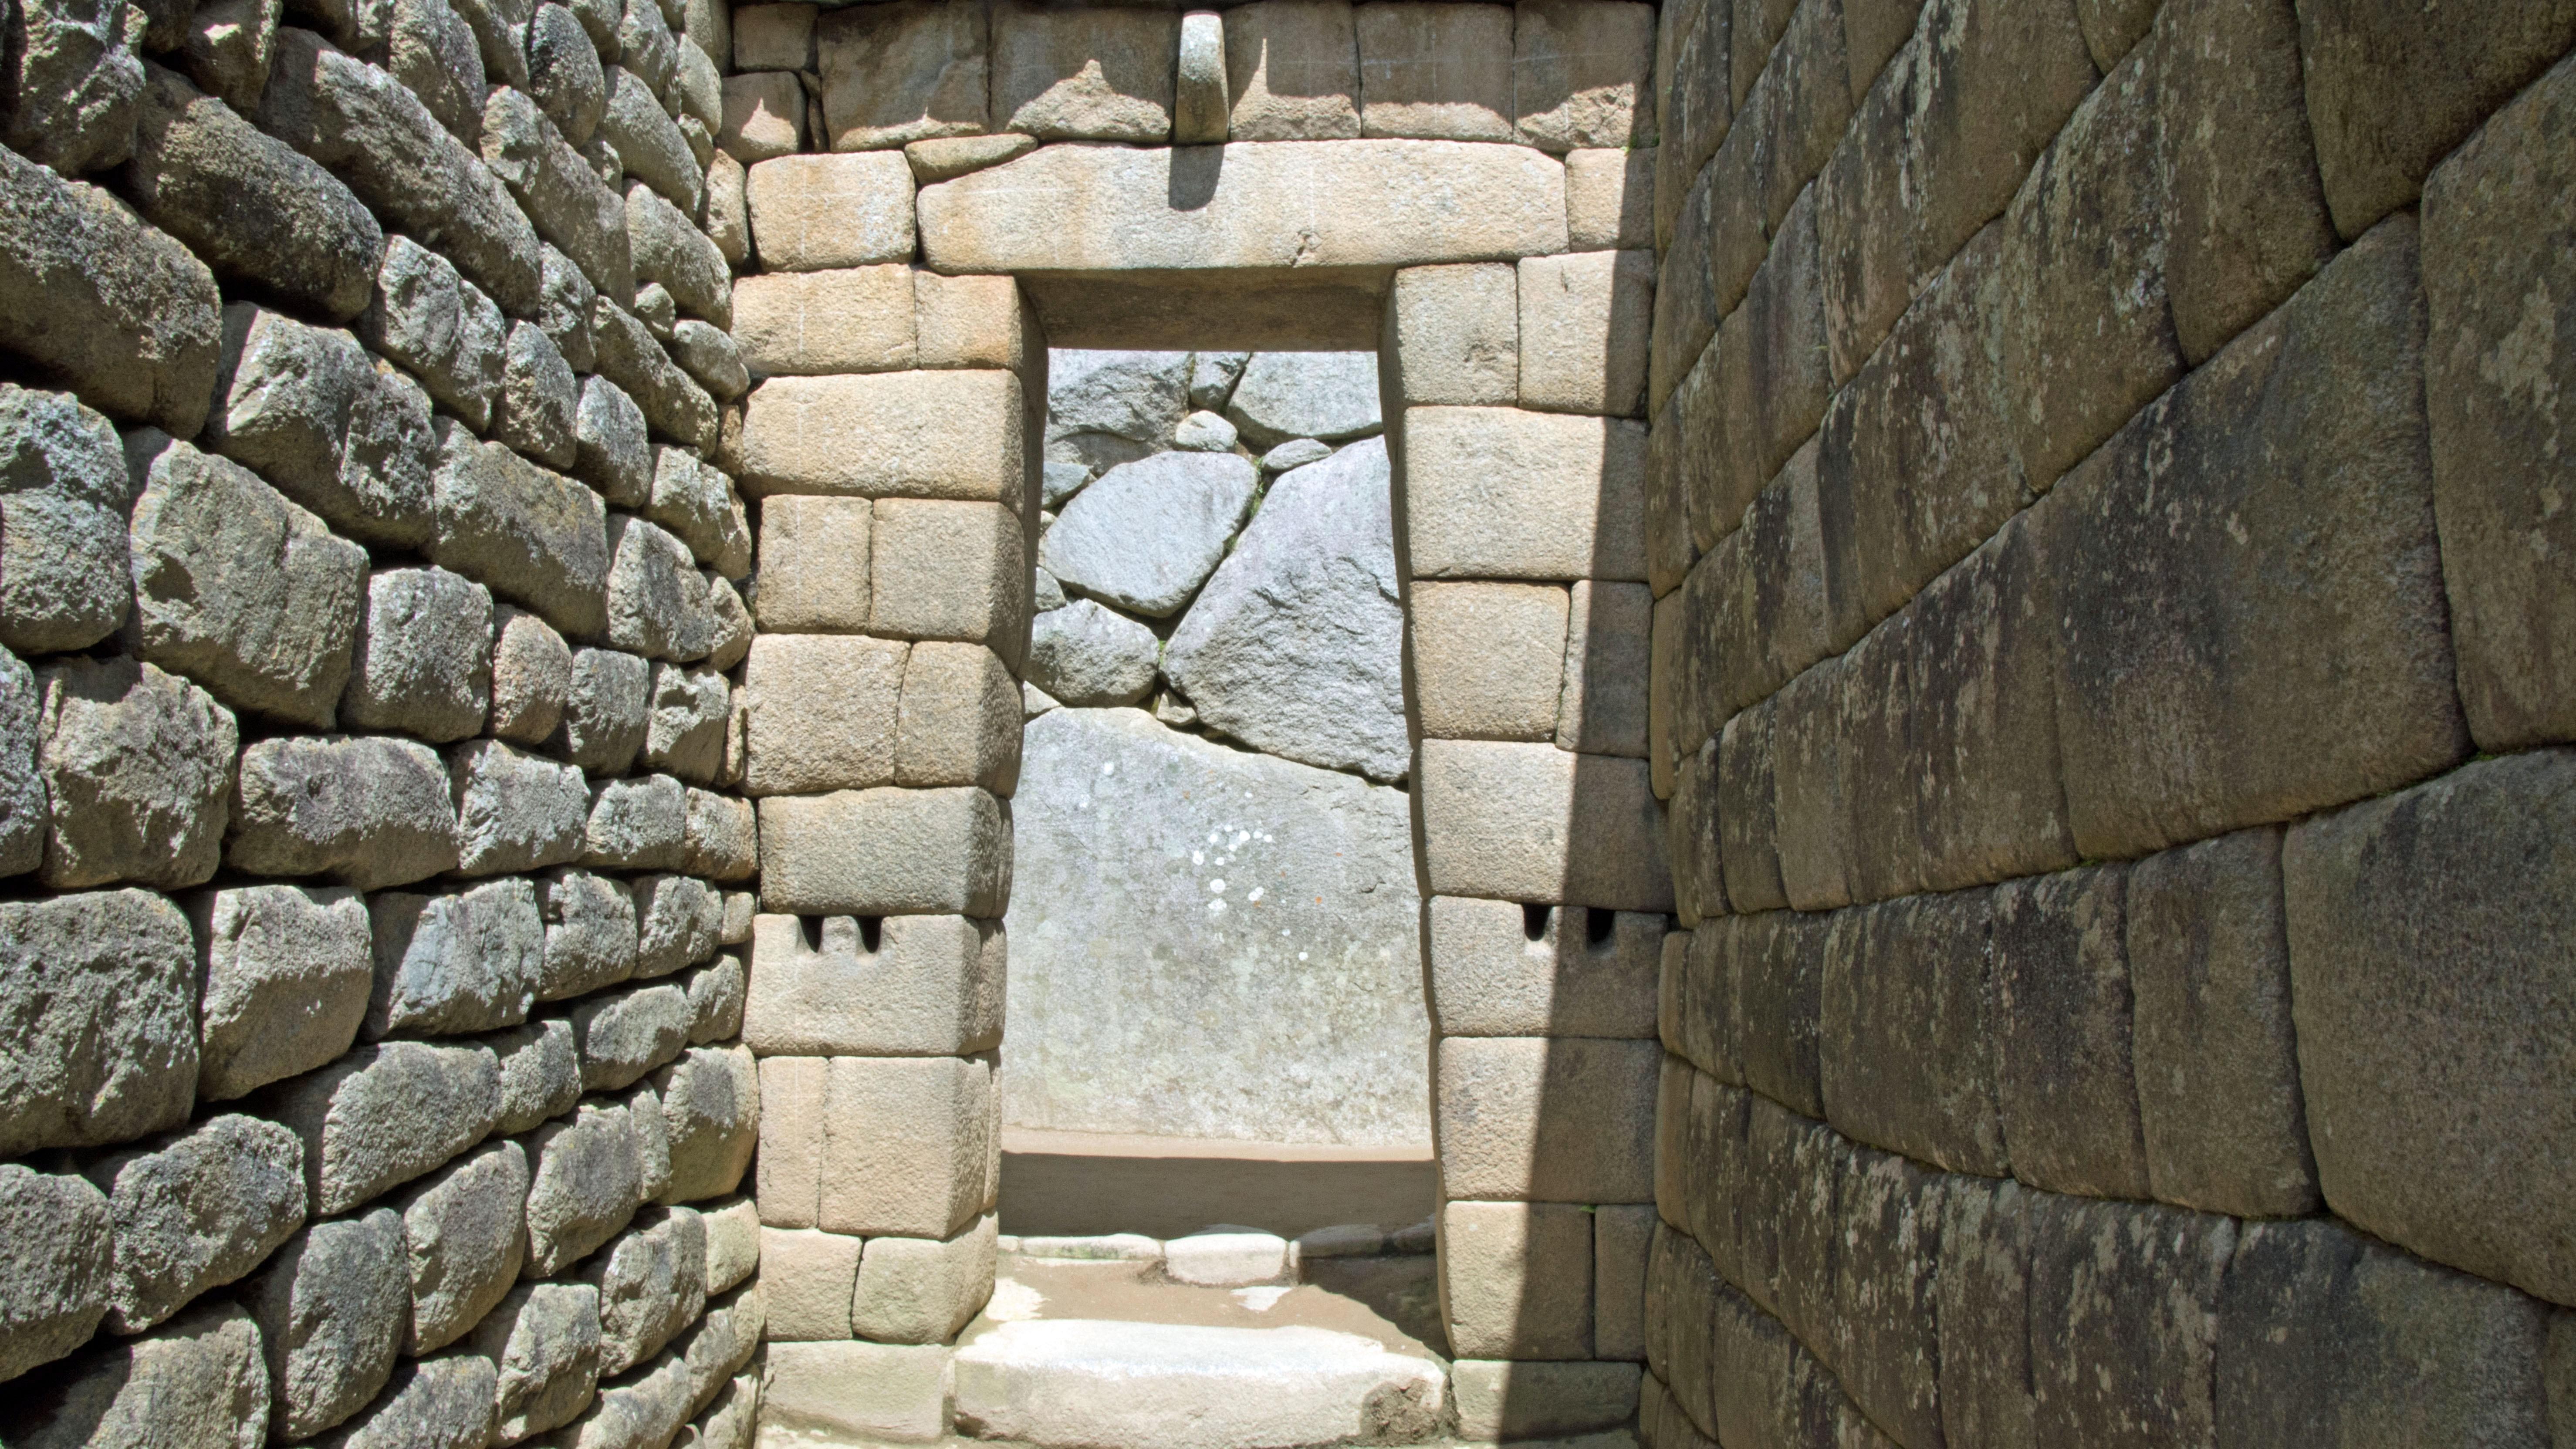 Inca Building Materials : Wallpaper temple architecture rock building wood